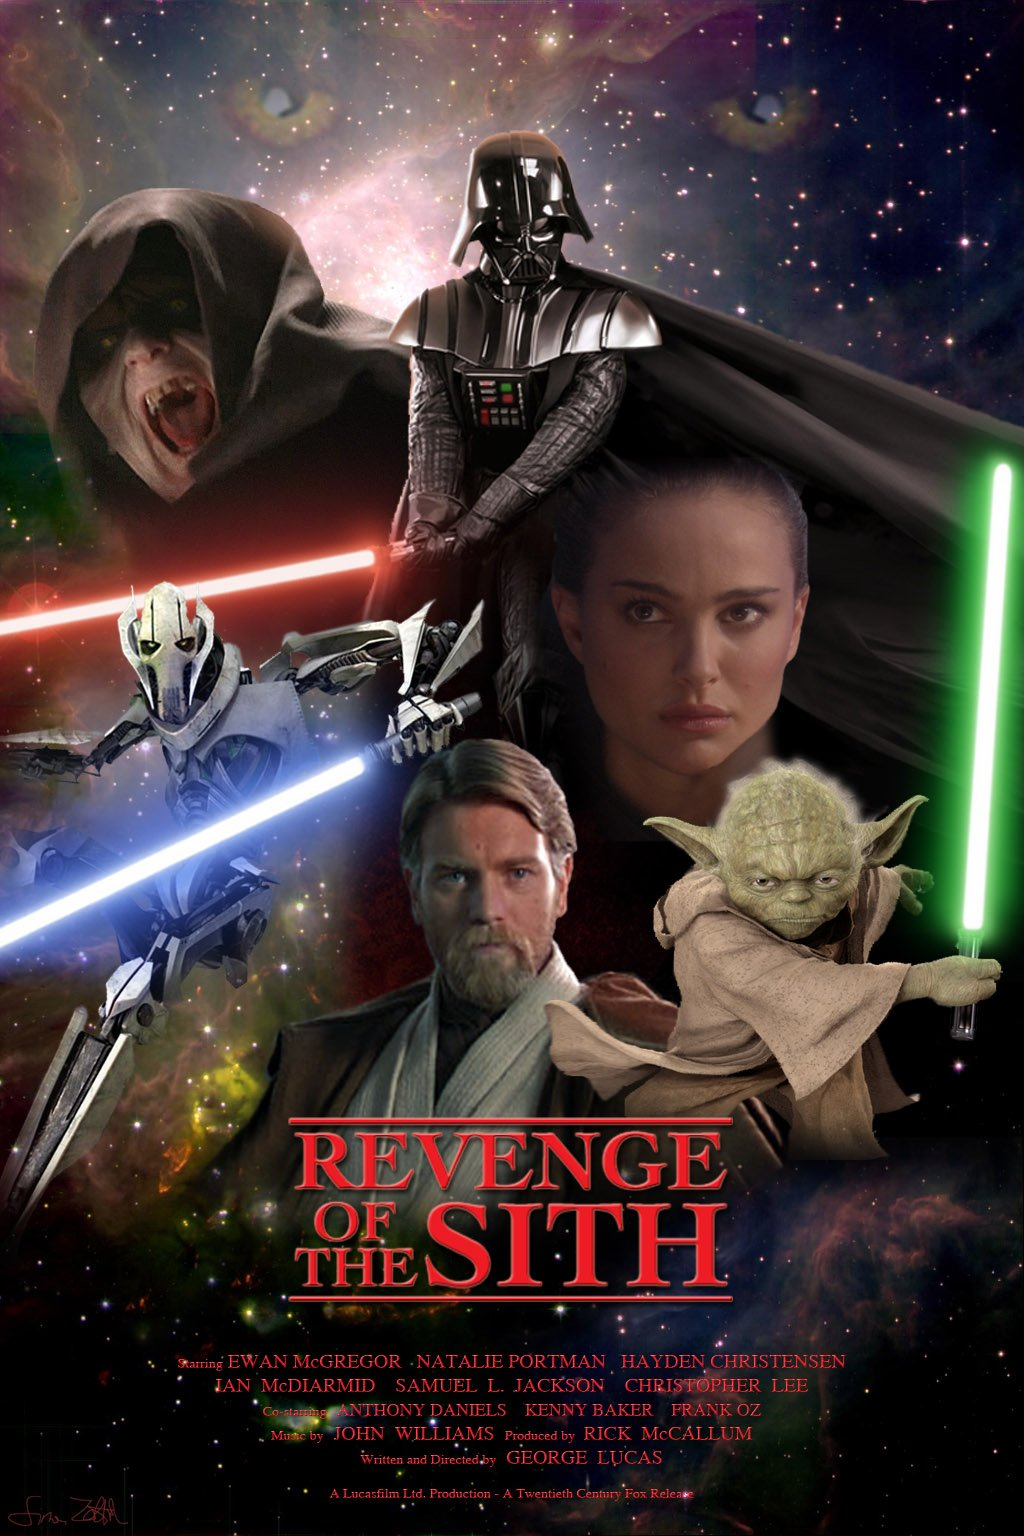 The Other Boleyn Girl Hd Wallpaper Star Wars Episode Iii Revenge Of The Sith 2005 Poster